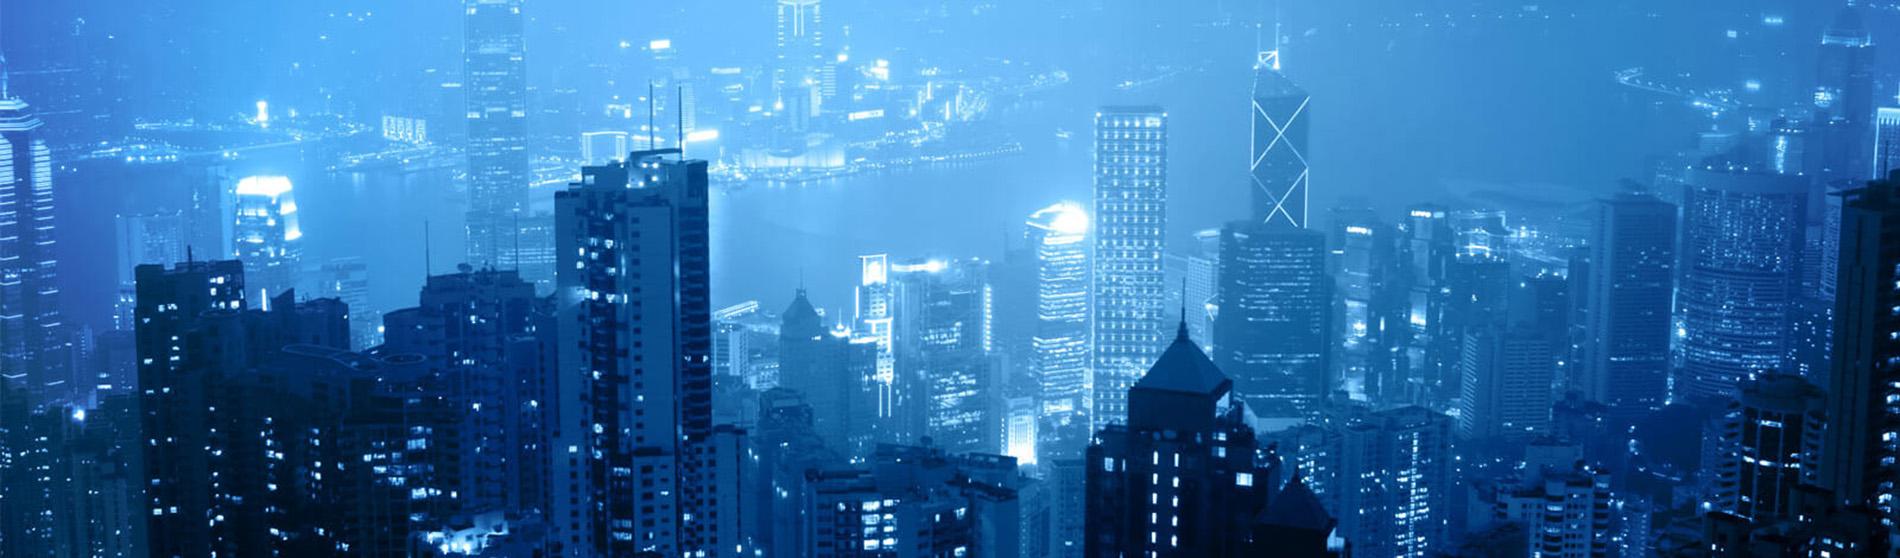 CDNetworks Expands Network Capacity 4x, Creates Global CDN Giant